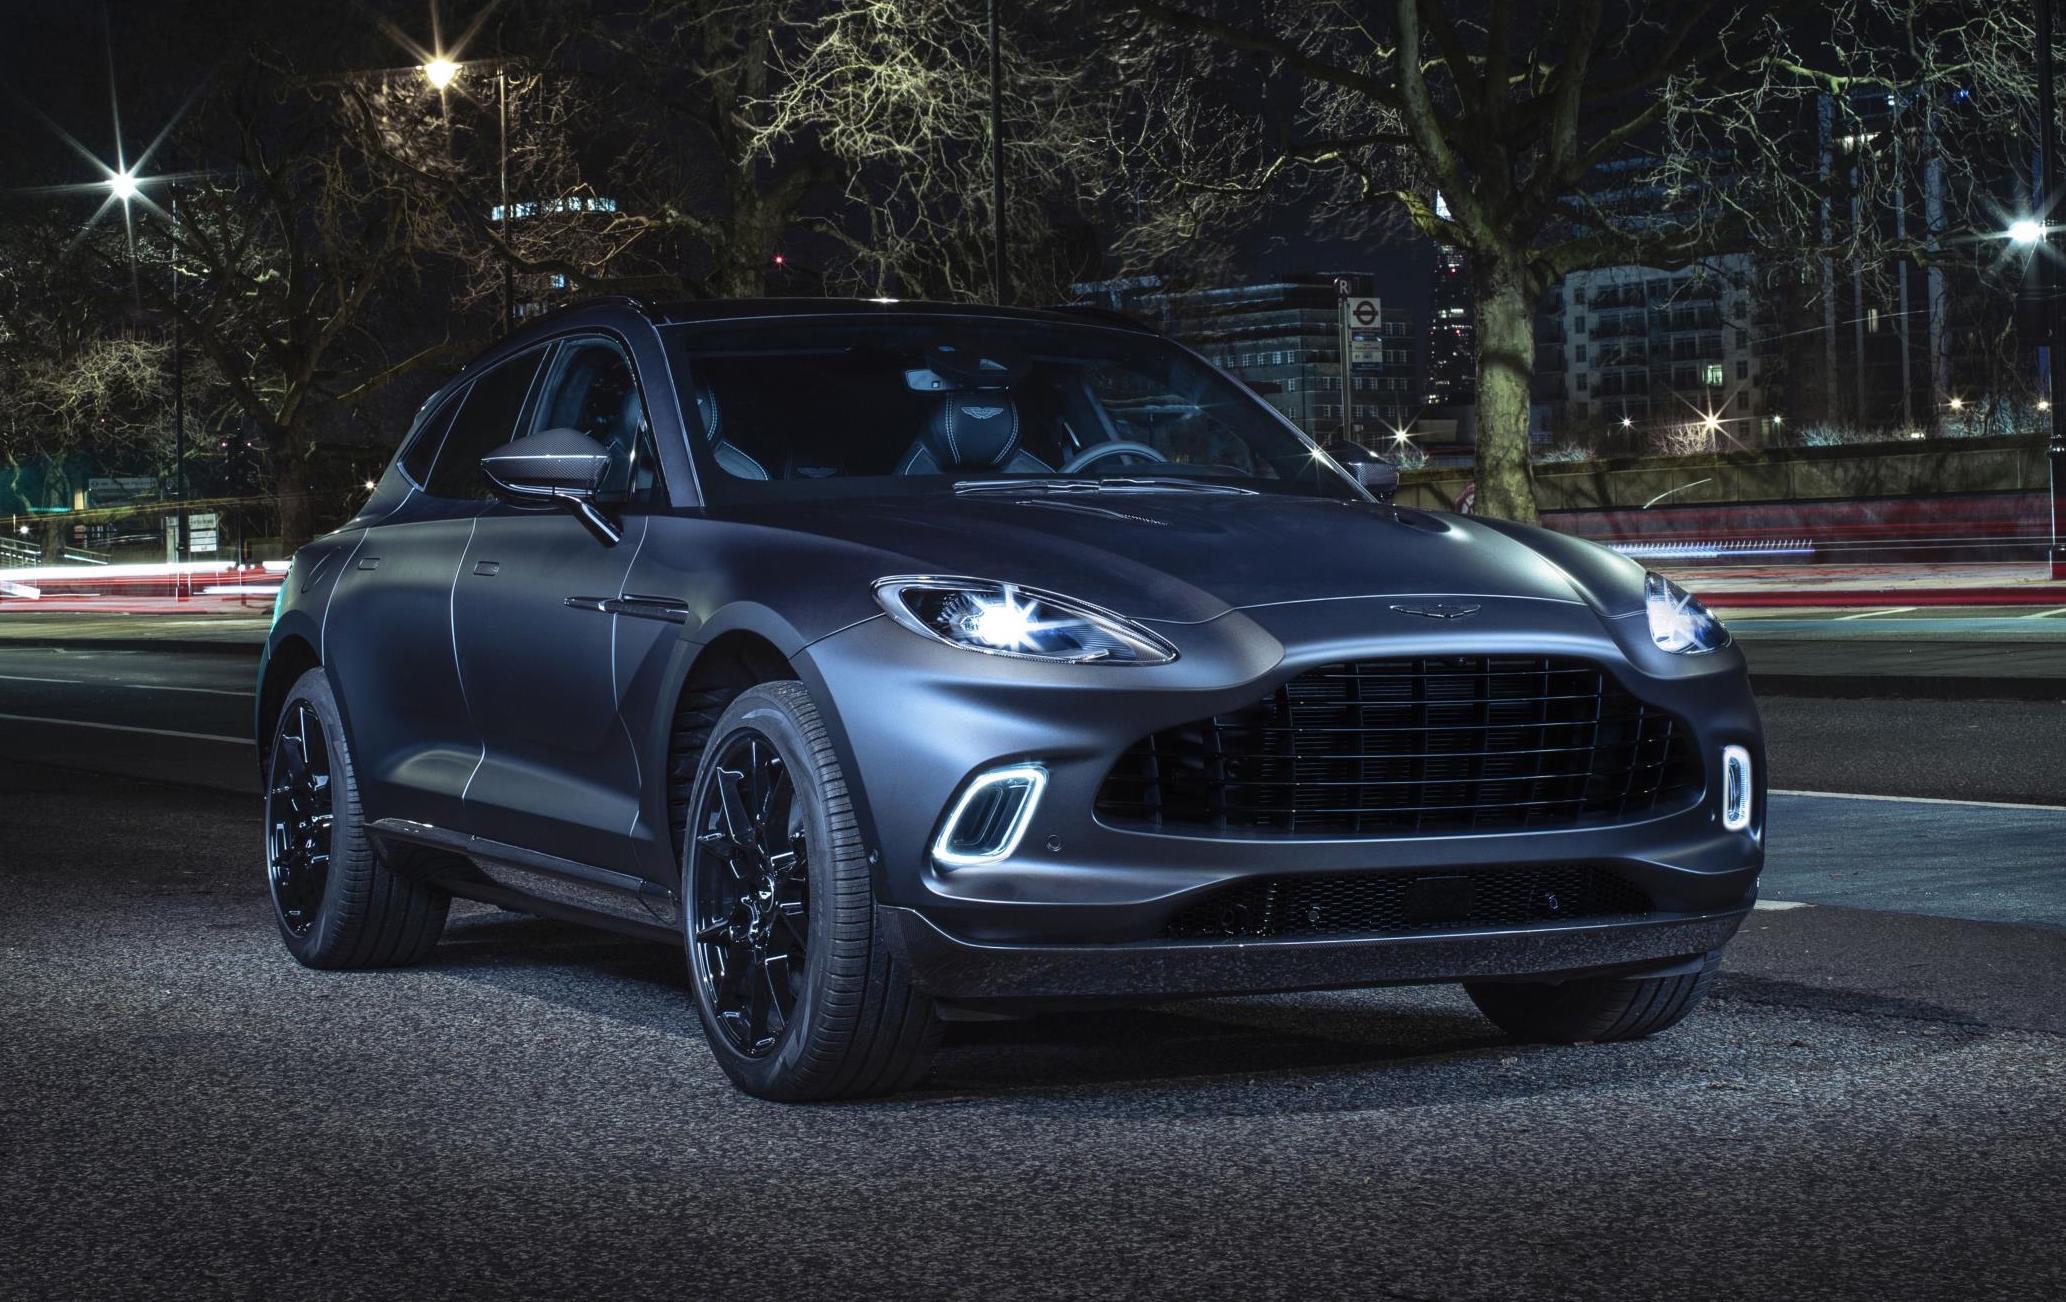 Aston Martin DBX shows off 'Q by Aston Martin' options